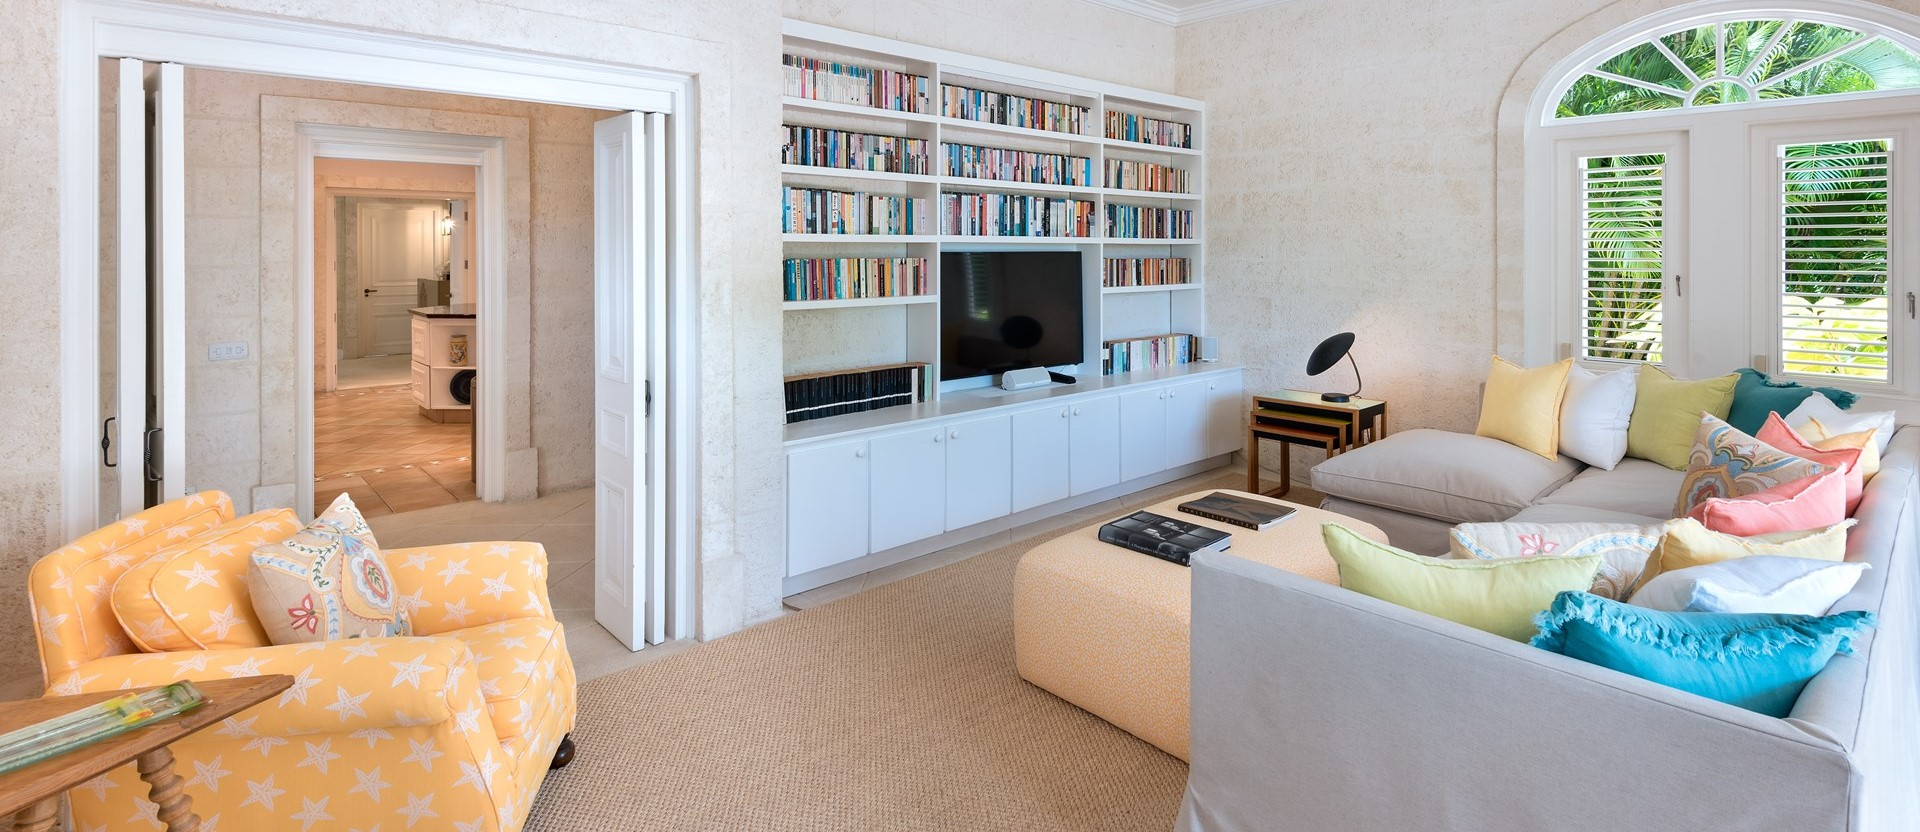 villa-gardenia-barbados-tv-lounge